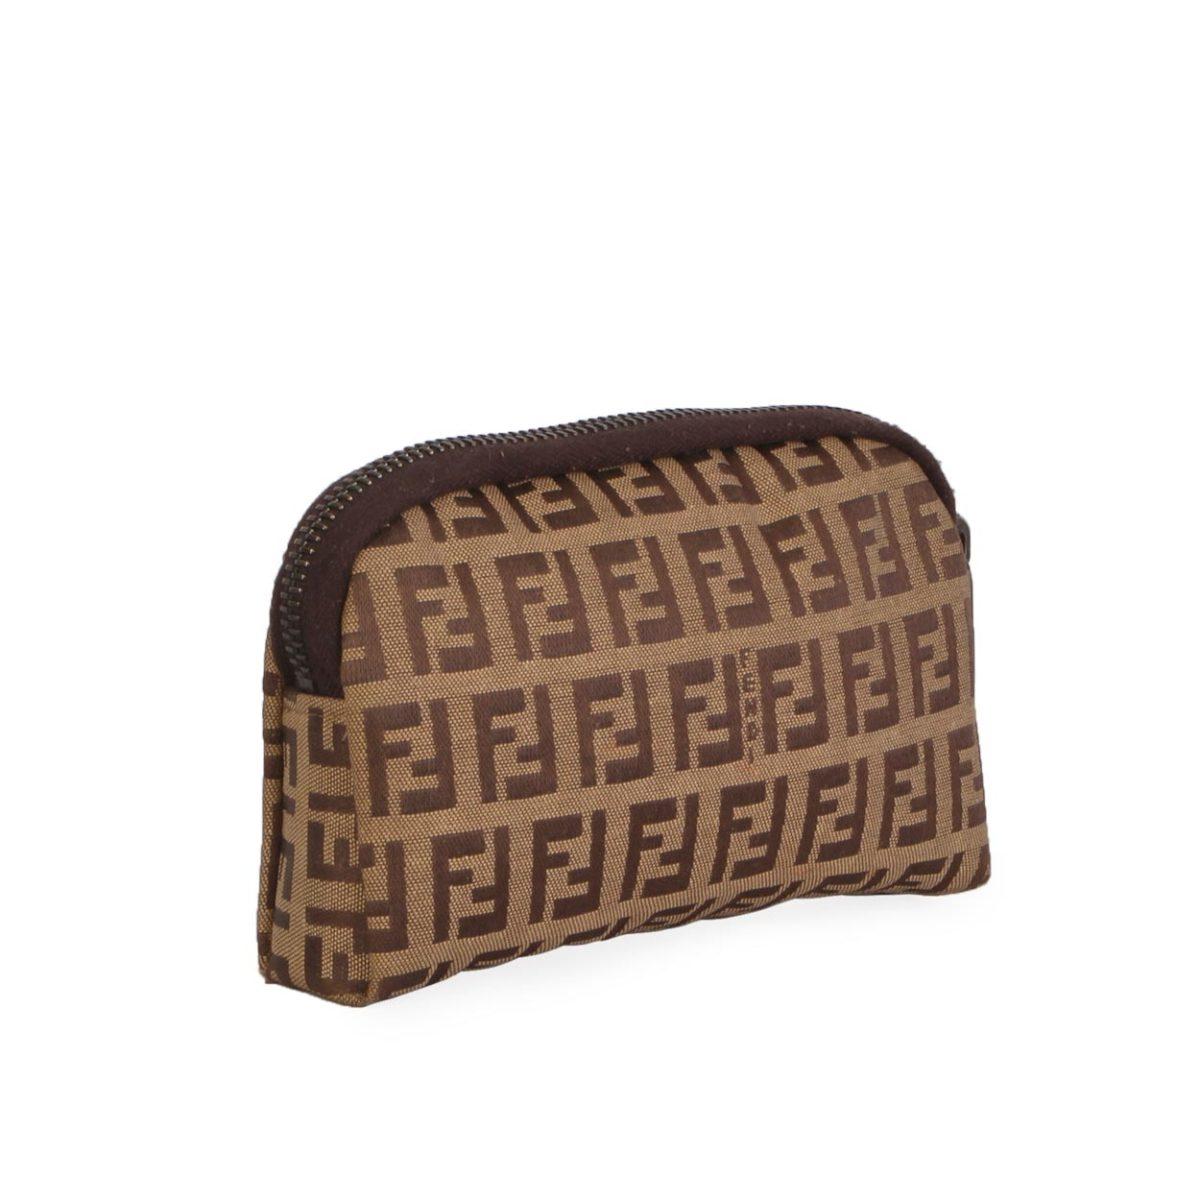 FENDI Zucchino Cosmetic Pouch  6be431914880c